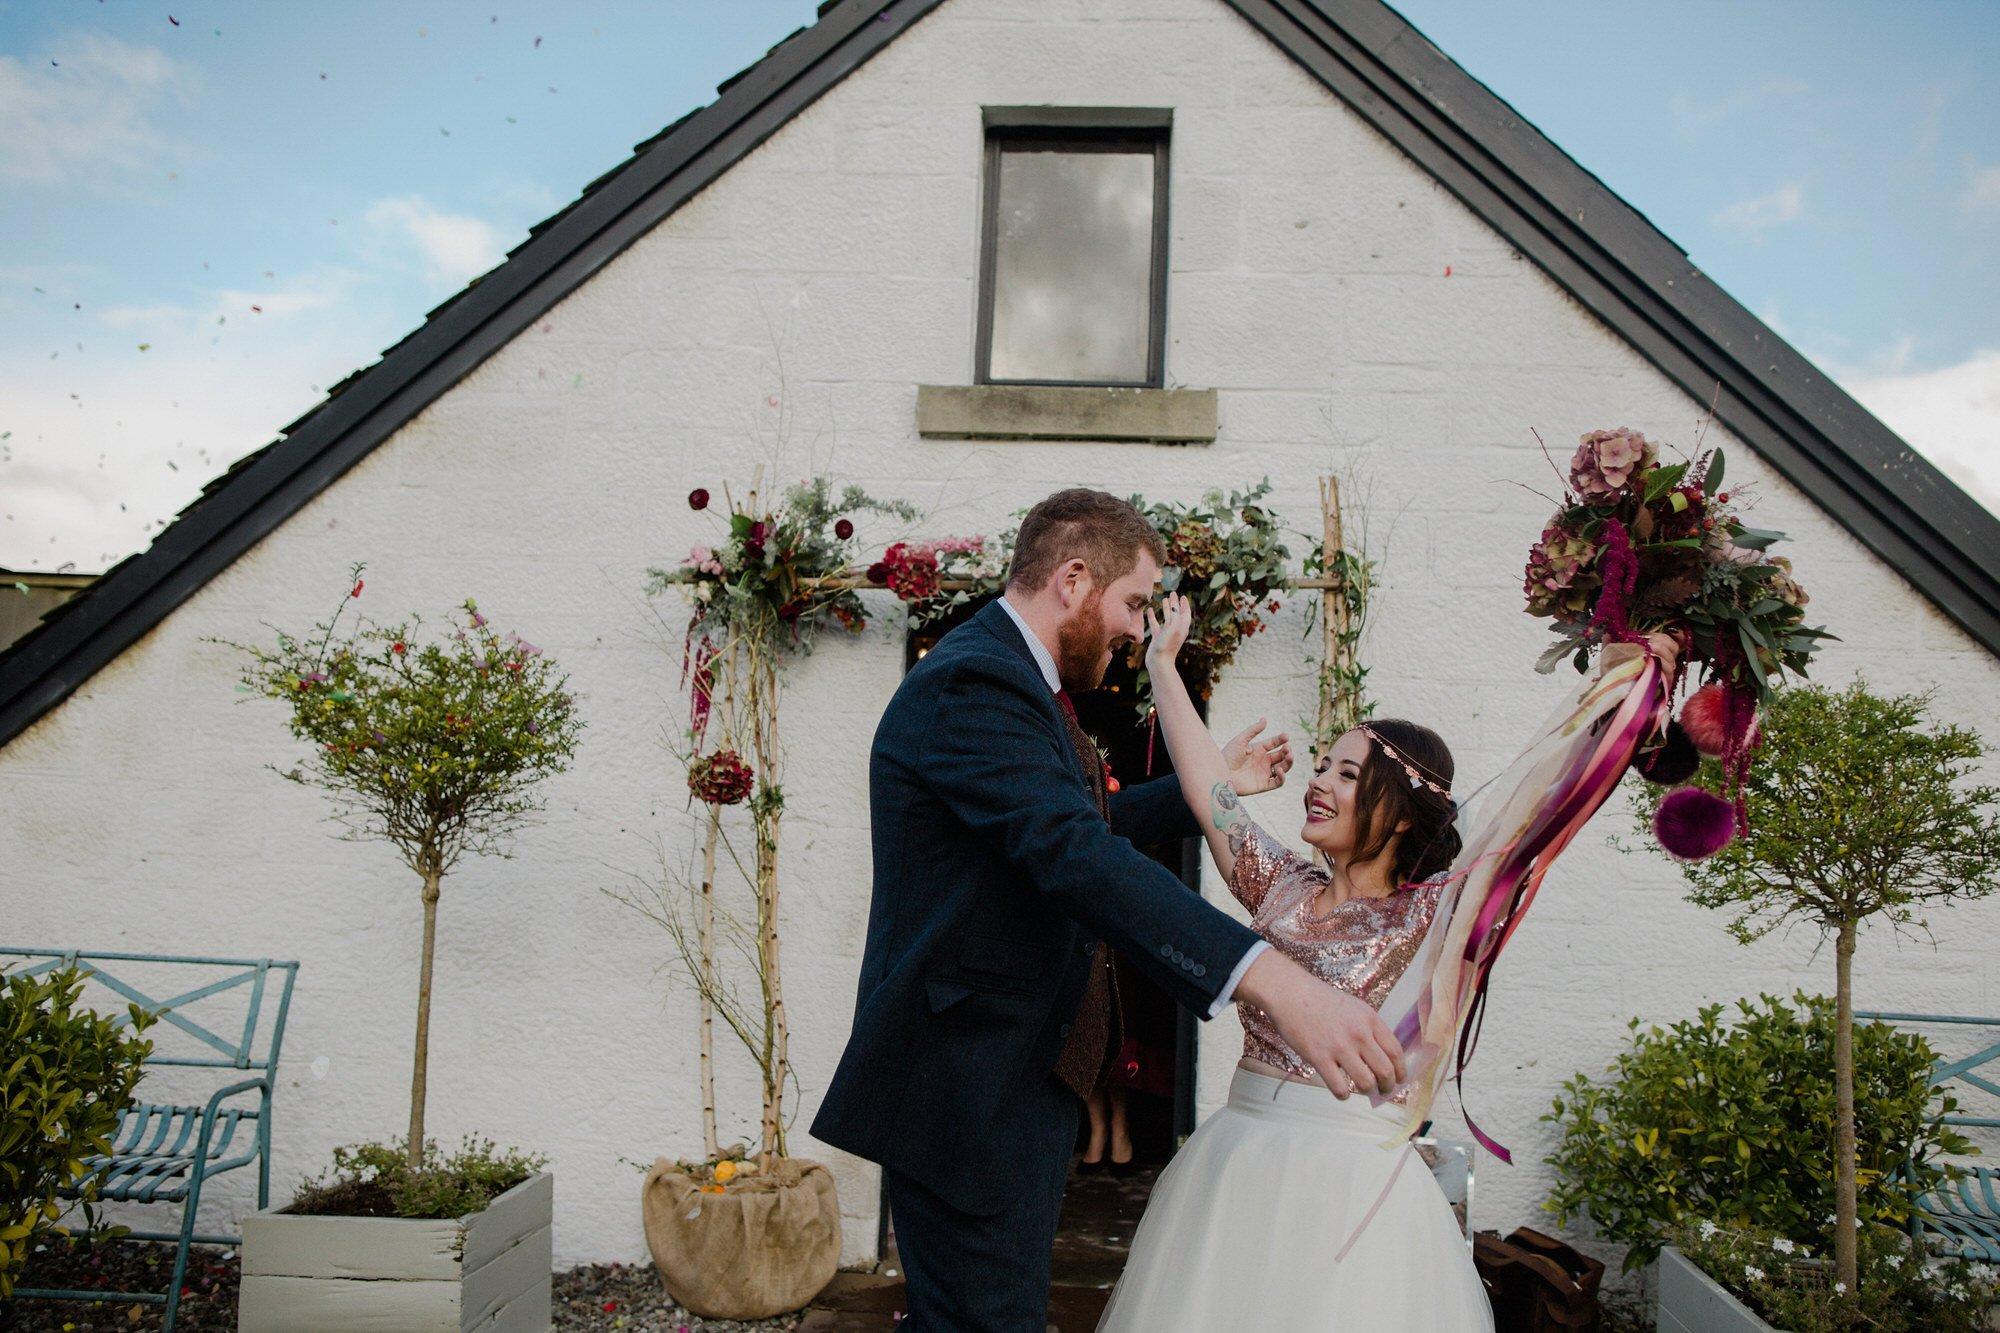 034 TIN SHED KNOCKRAICH FARM WEDDING ALTERNATIVE BRIDE ZOE ALEXANDRA PHOTOGRAPHY